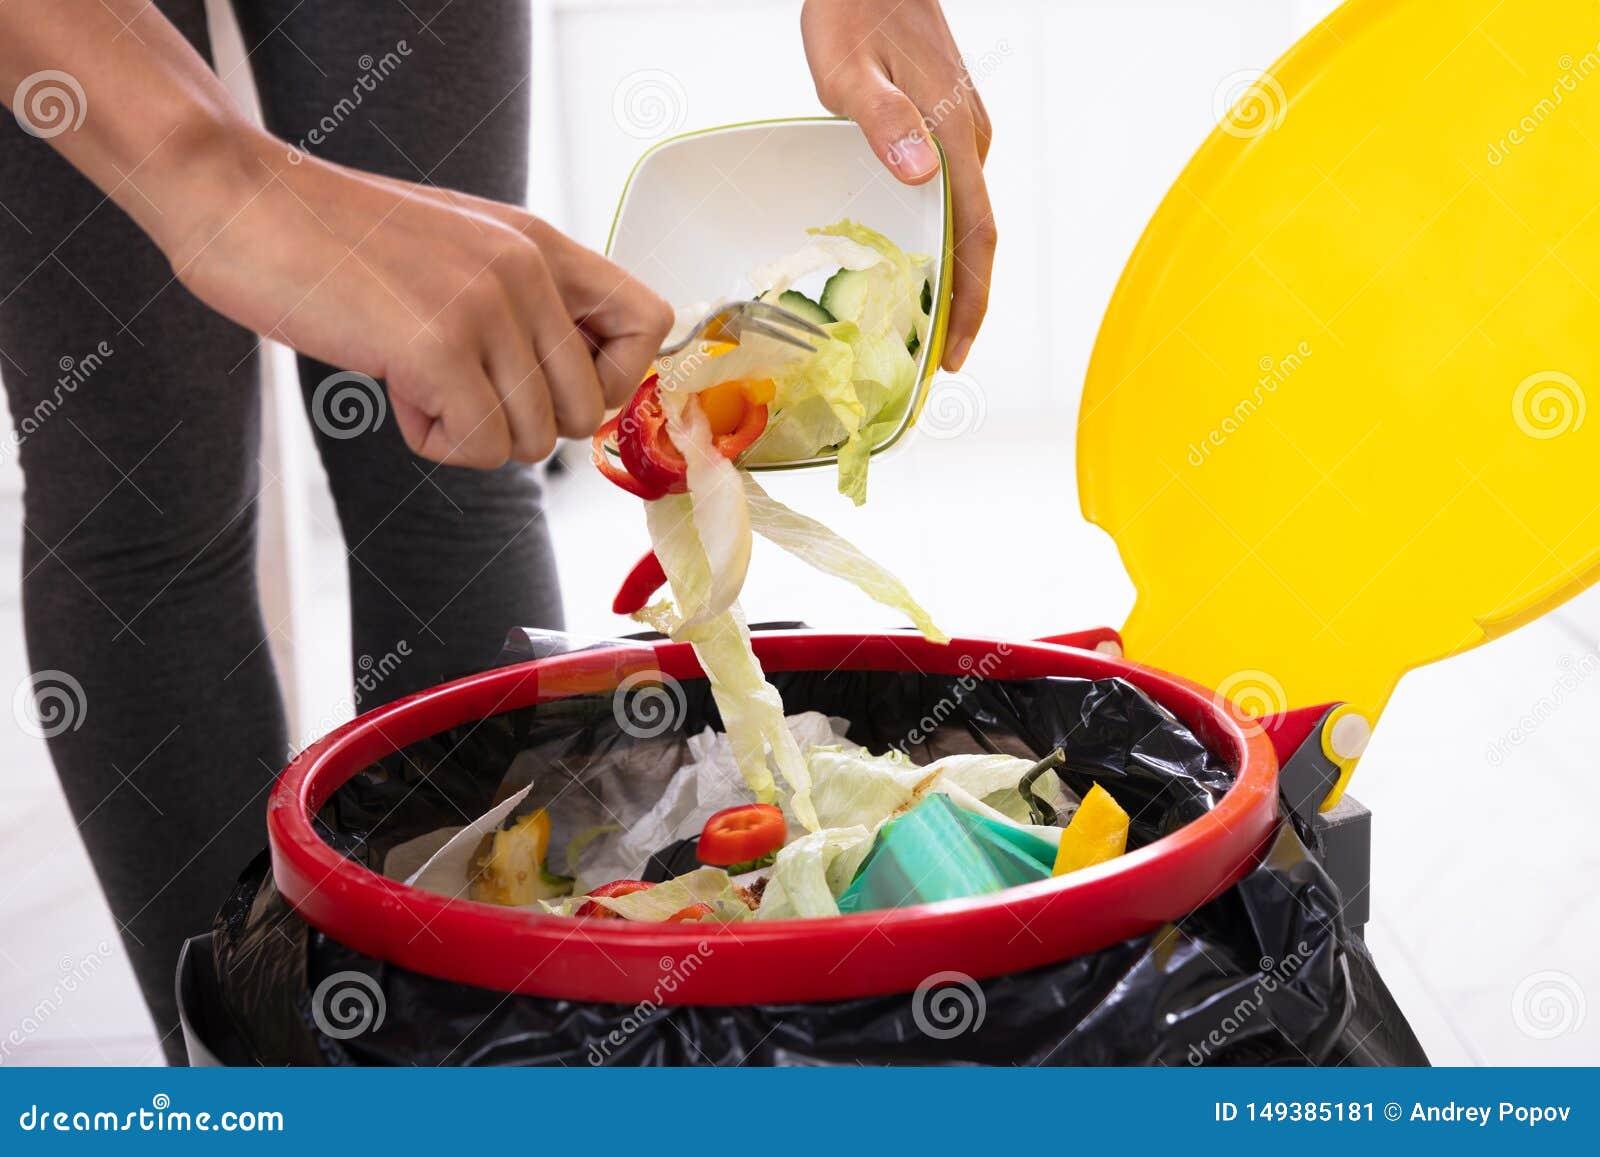 Woman Throwing Salad In Trash Bin